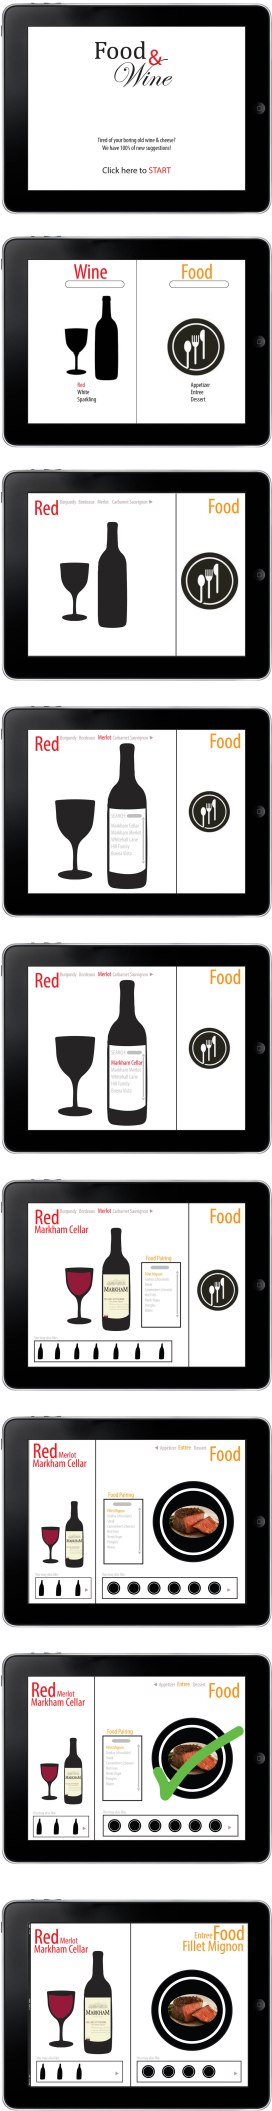 wineappfinal